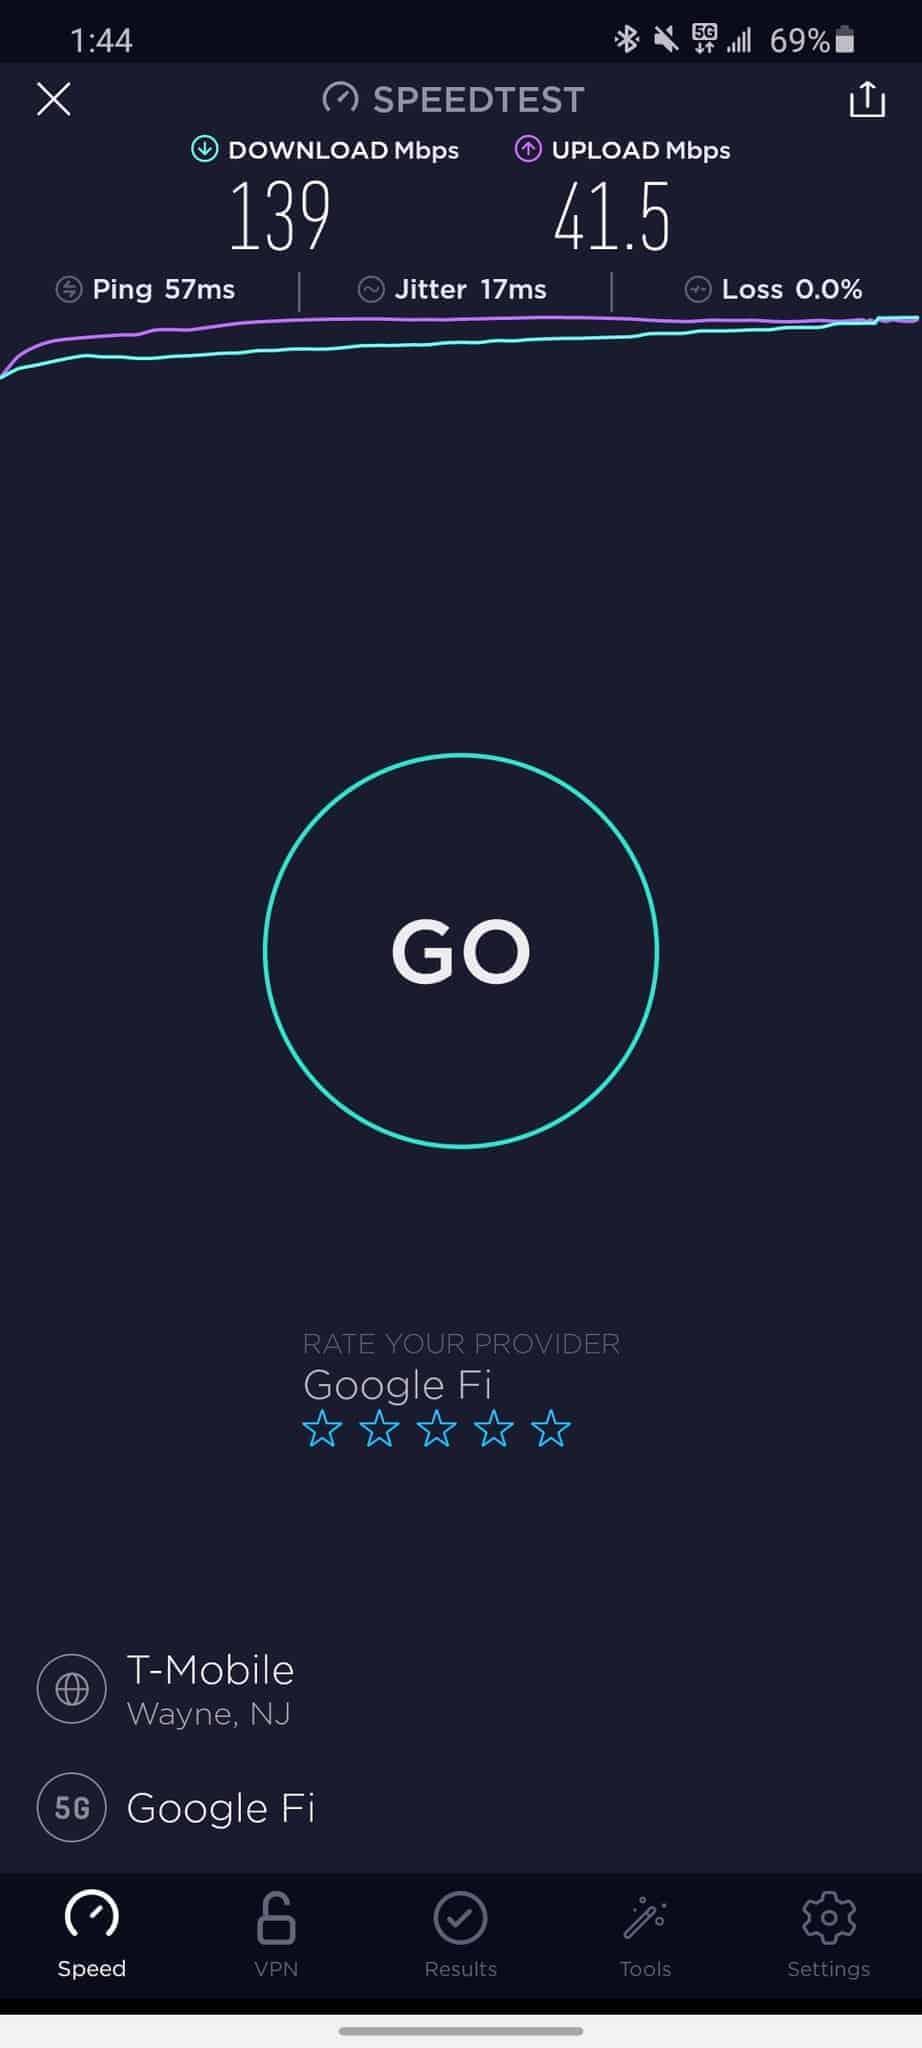 Google Fi T-Mobile 5G speed test 2